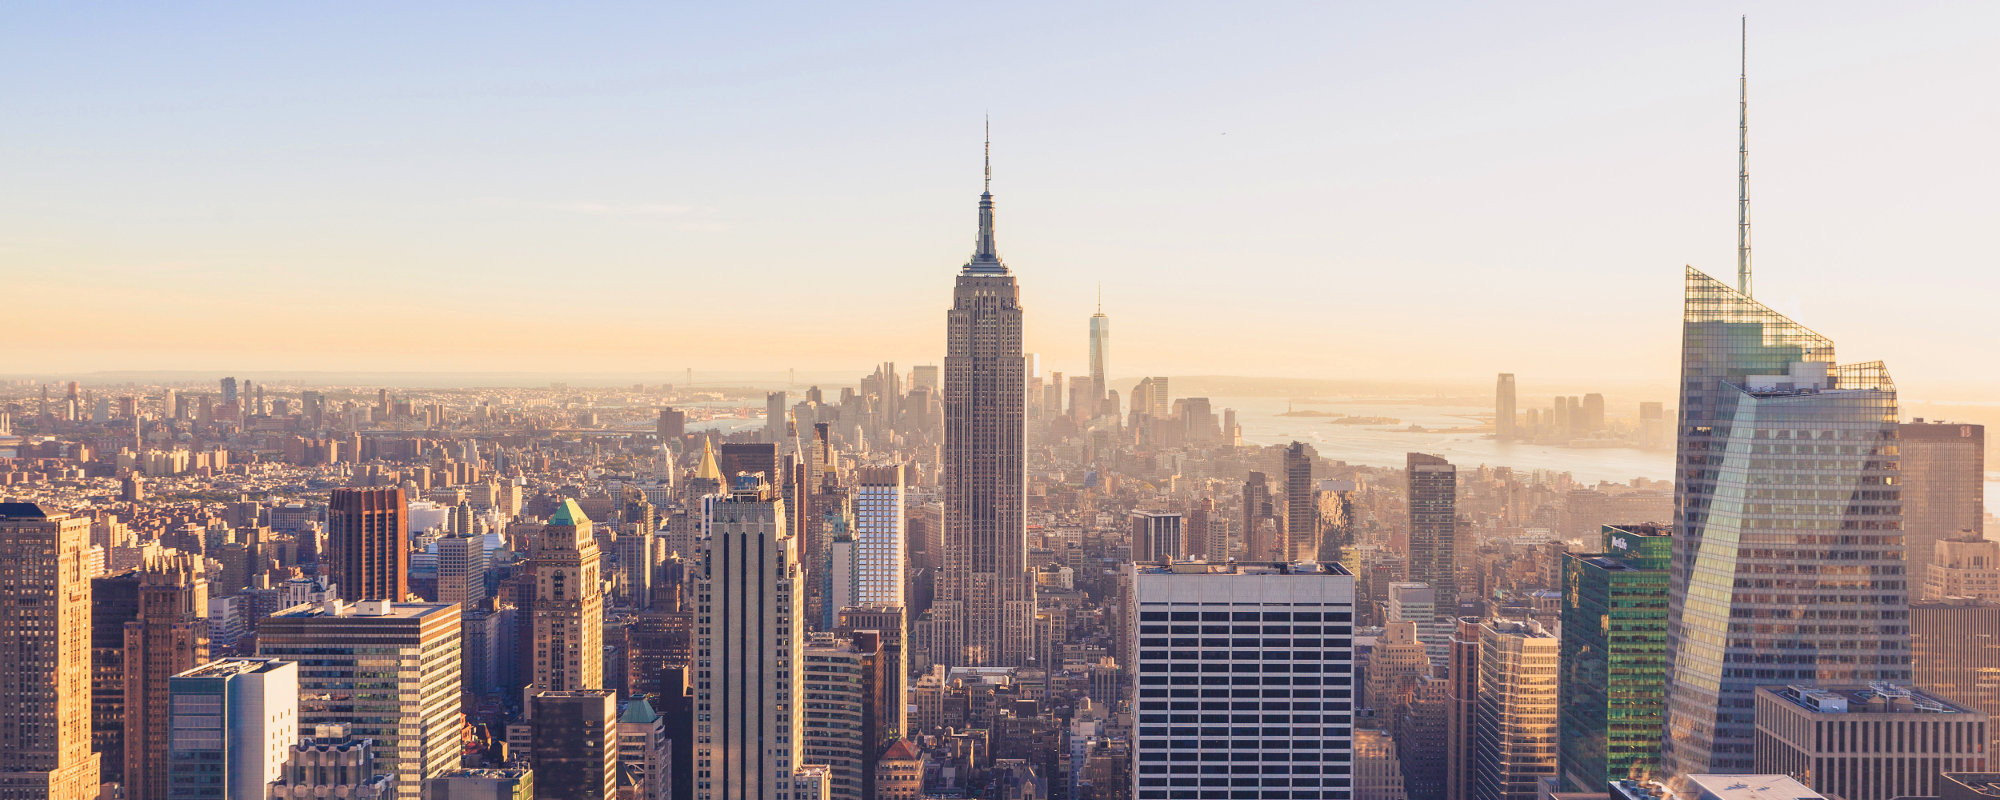 Travel to New York City to undergo cosmetic plastic surgery with Dr. Joshua Zuckerman.